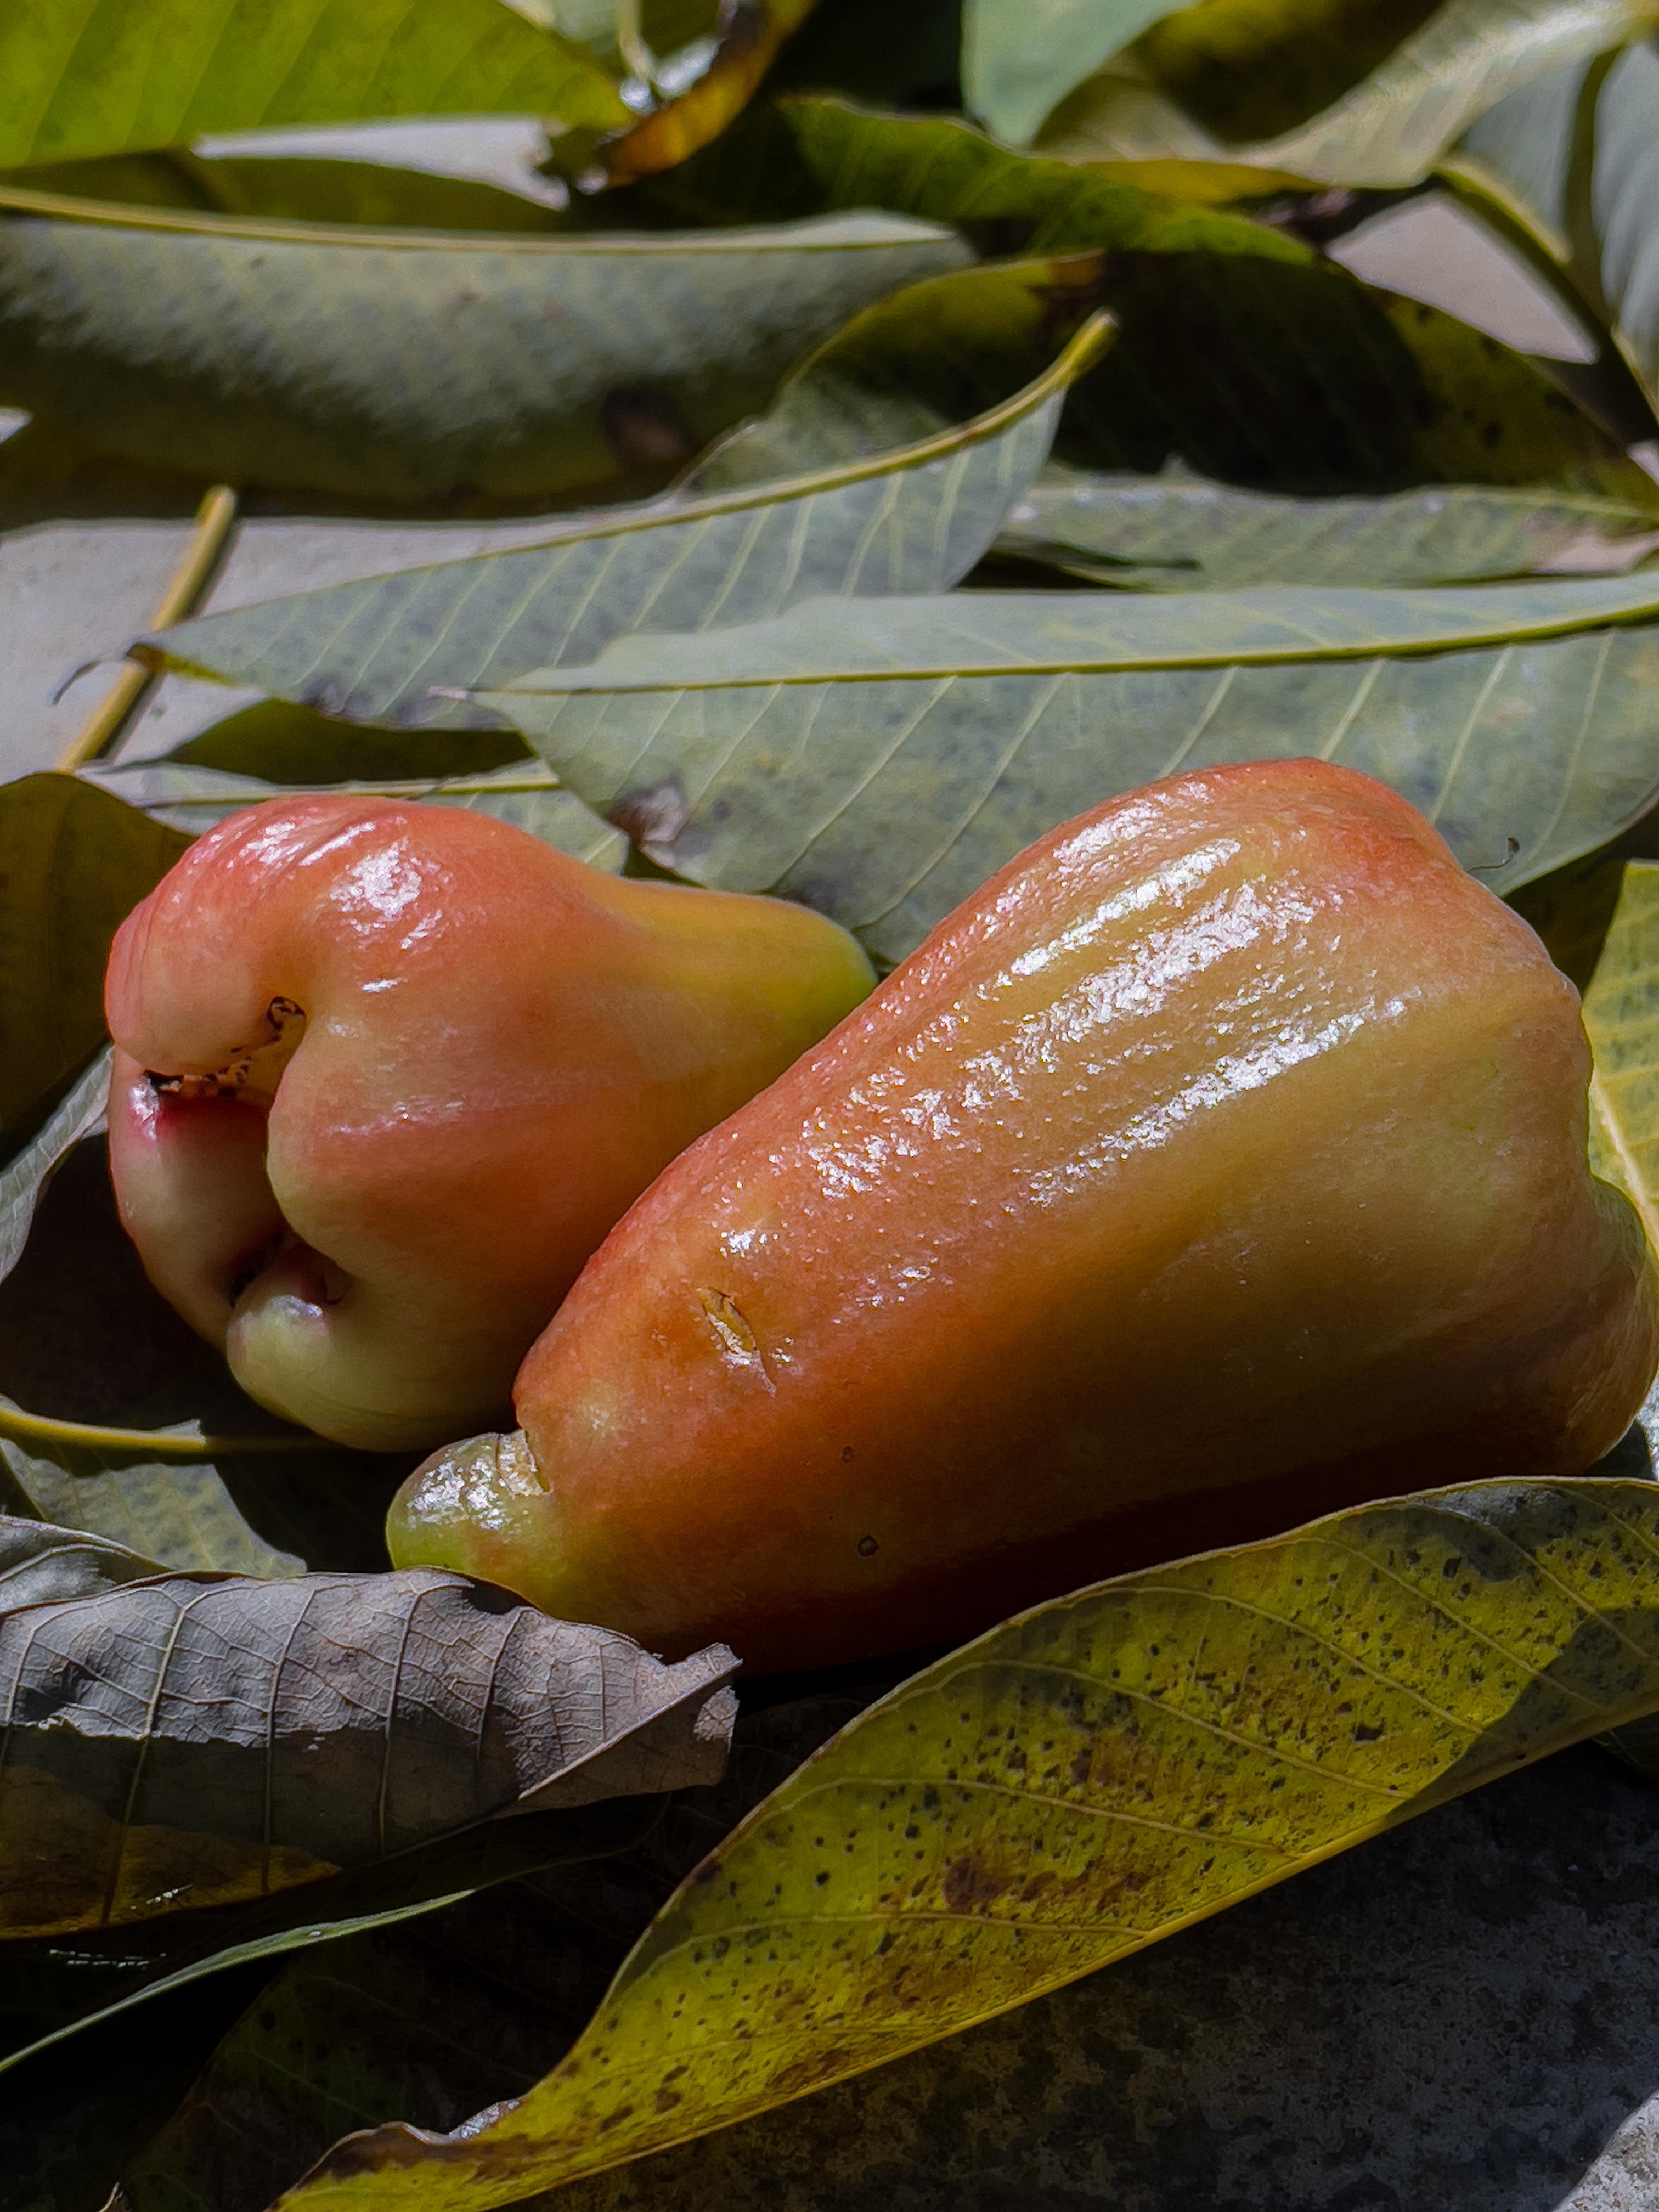 Wax apple: juicy, crunchy and refreshing